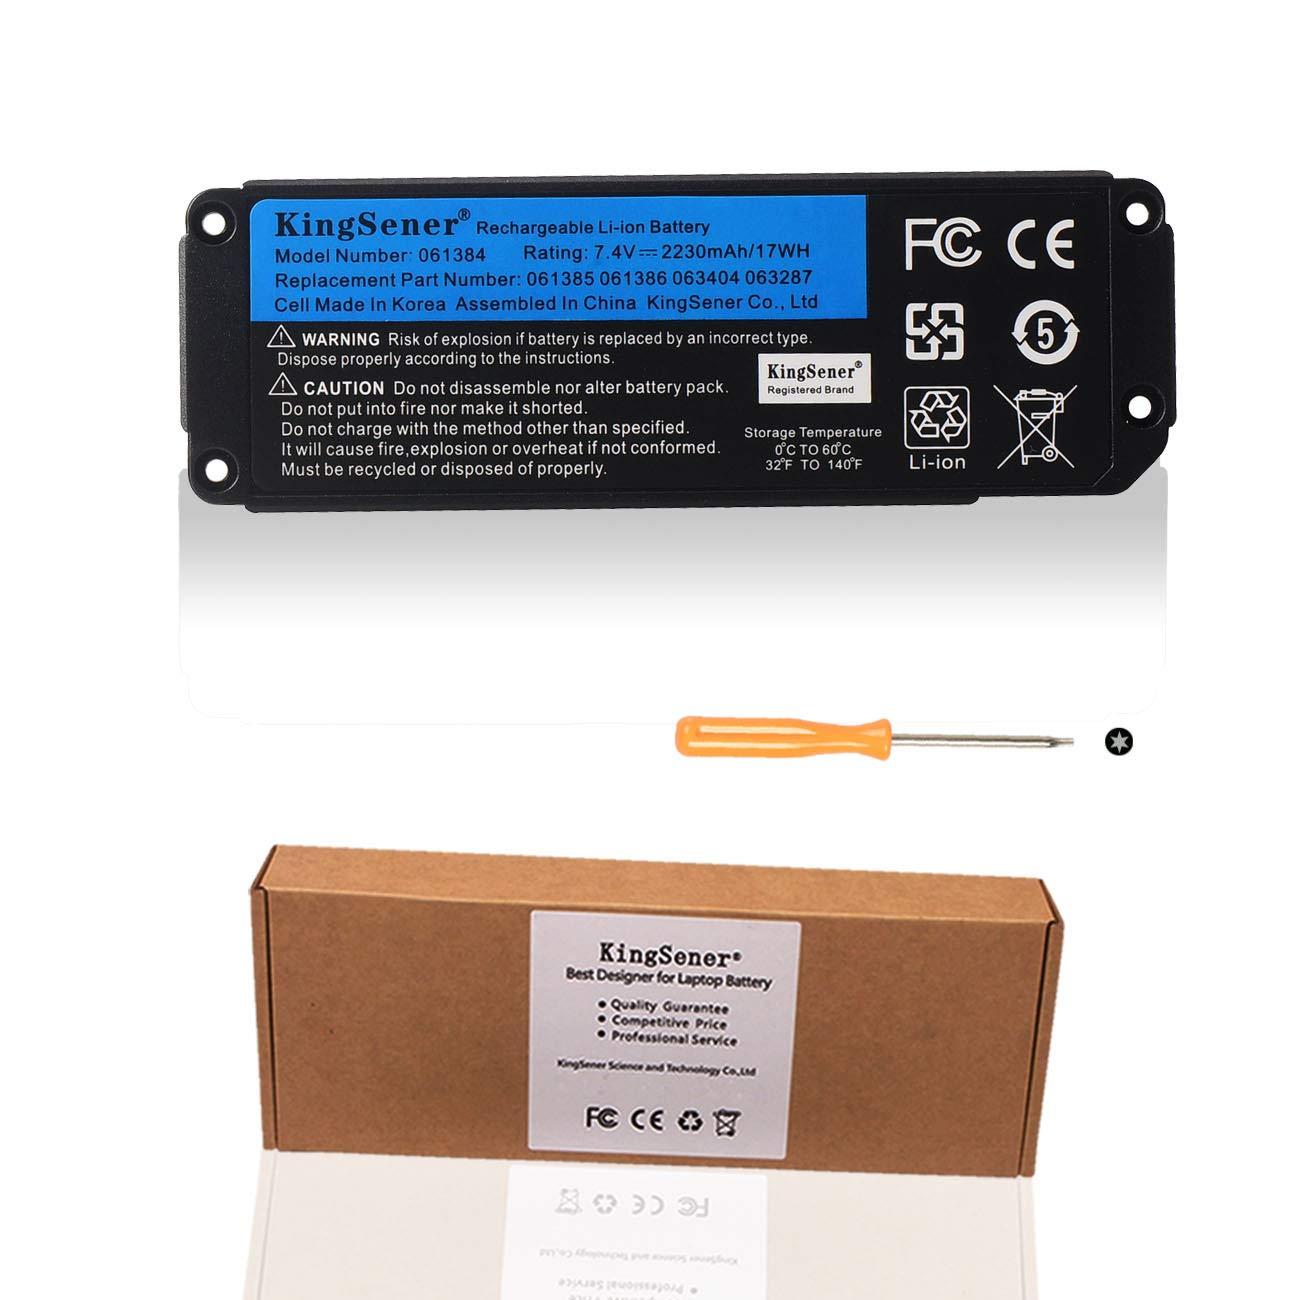 7.4V 2230mAh 17Wh 061384 061385 061386 063404 063287 Speaker Battery Replacement for Bose Soundlink Mini 1 one Bose Soundlink Mini I Bluetooth Speaker Wireless Speaker Mini one